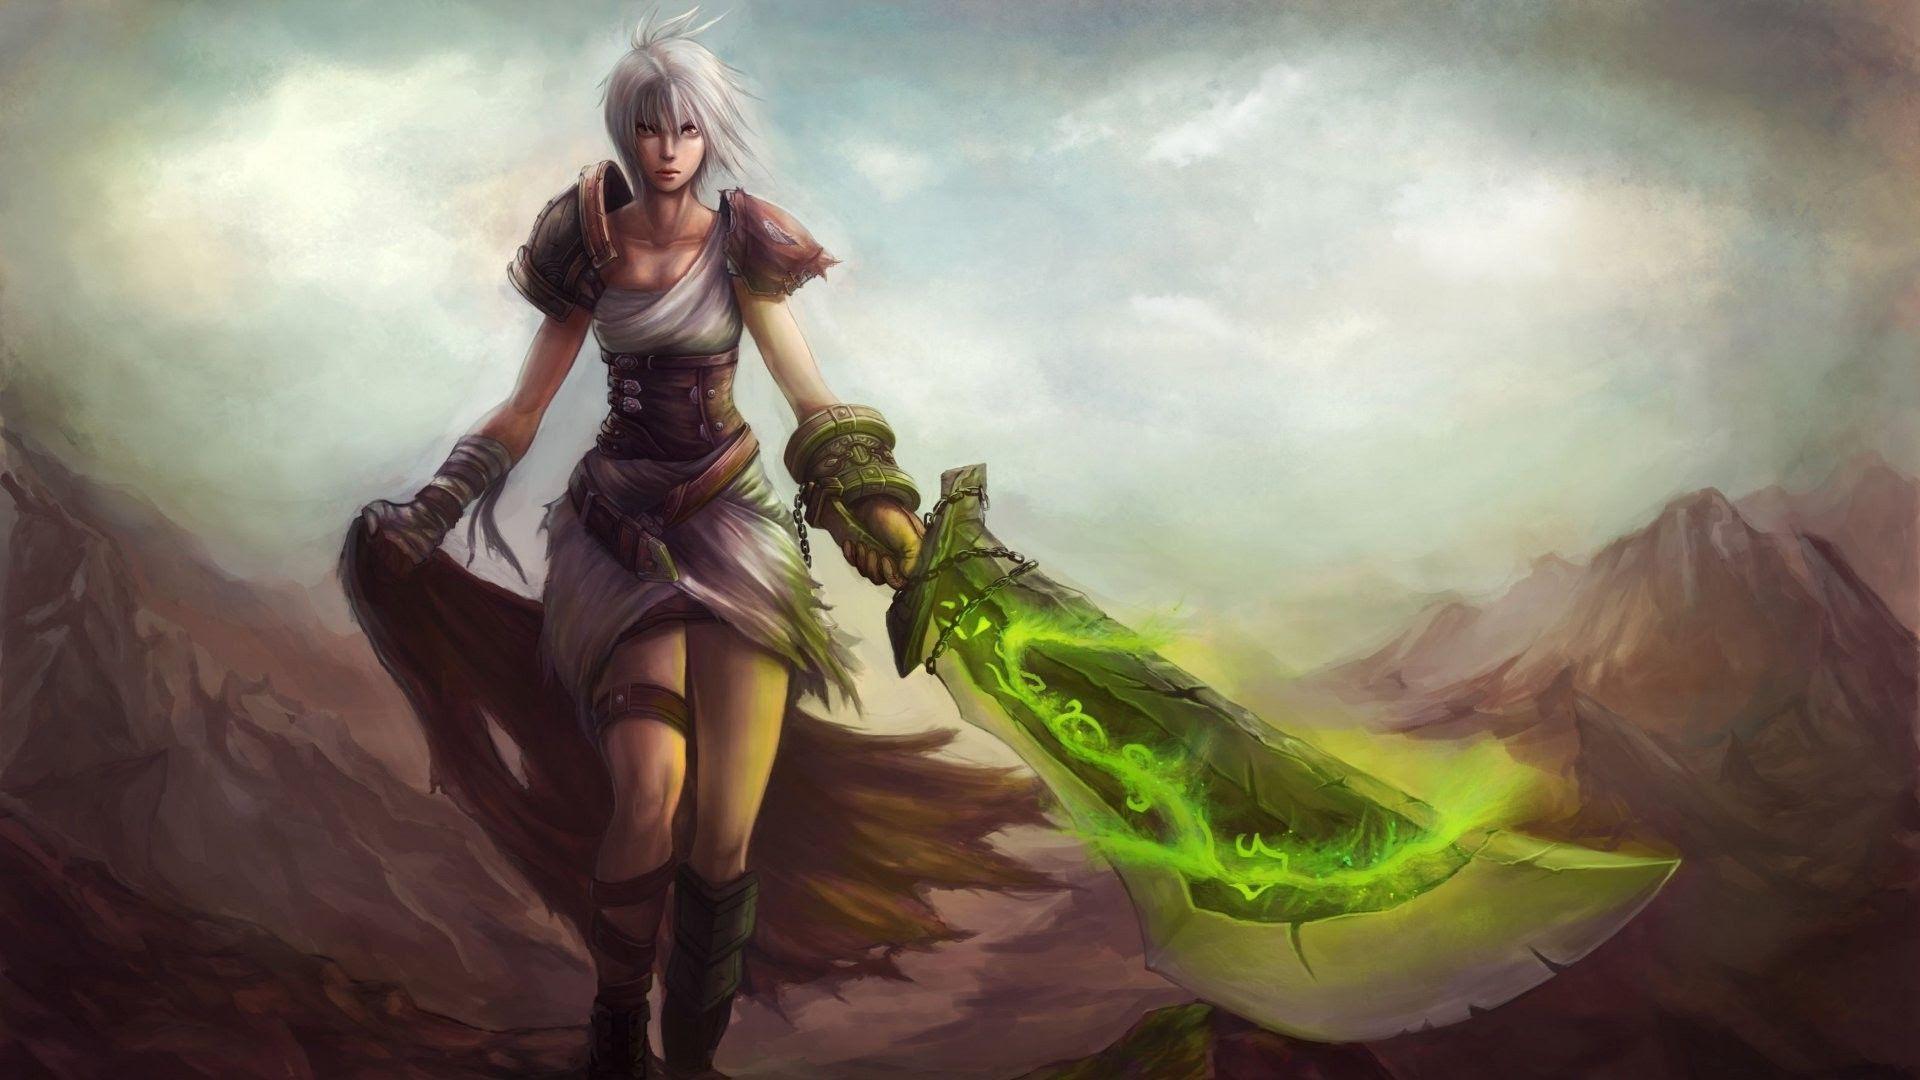 Riven League Of Legends Wallpaper 1920x1080 25786